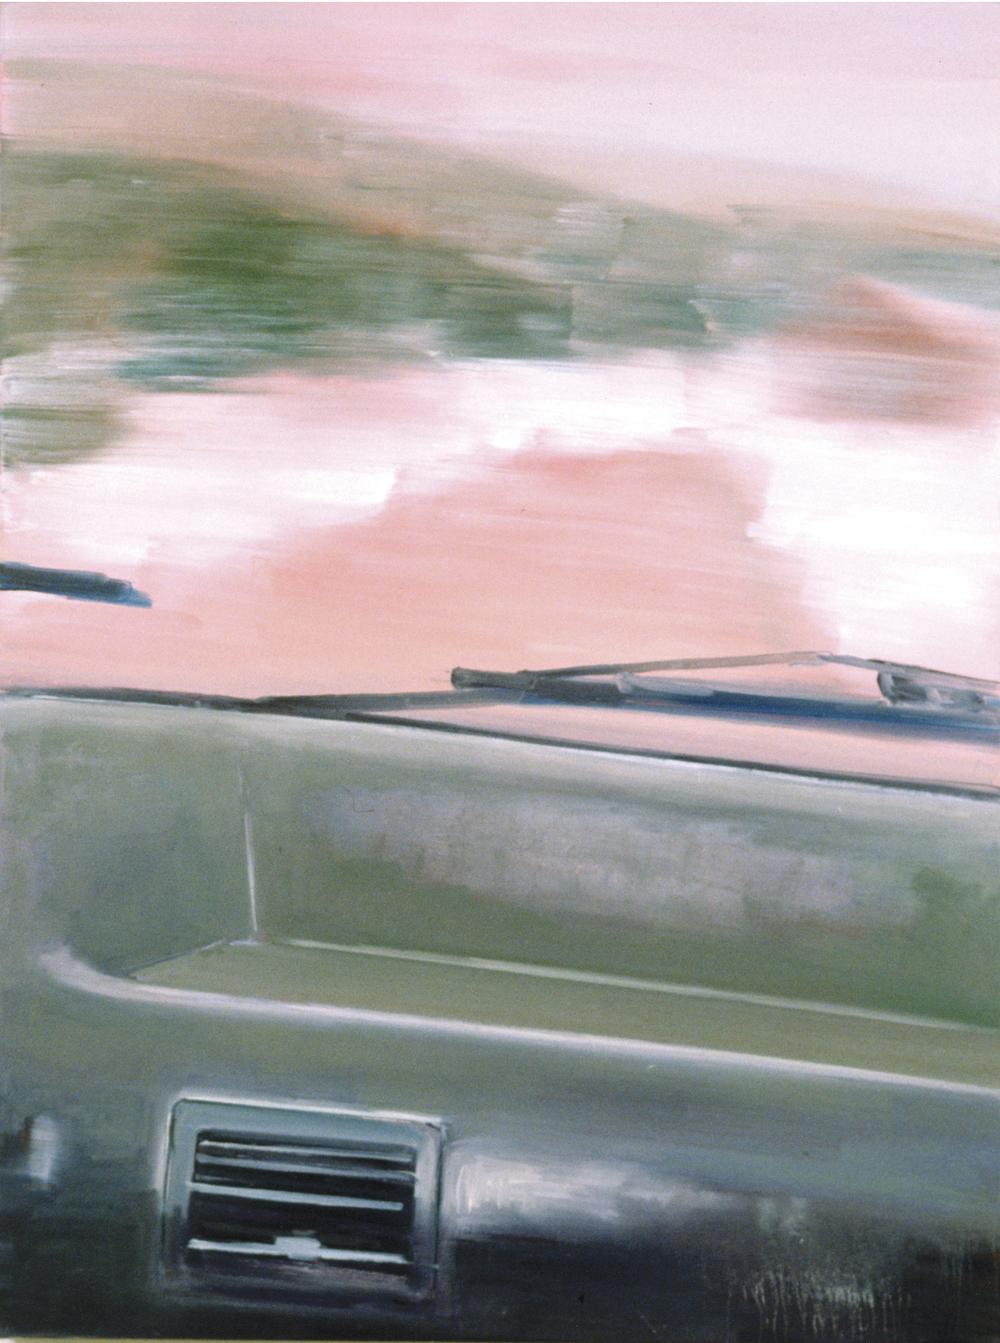 Passenger, 2003